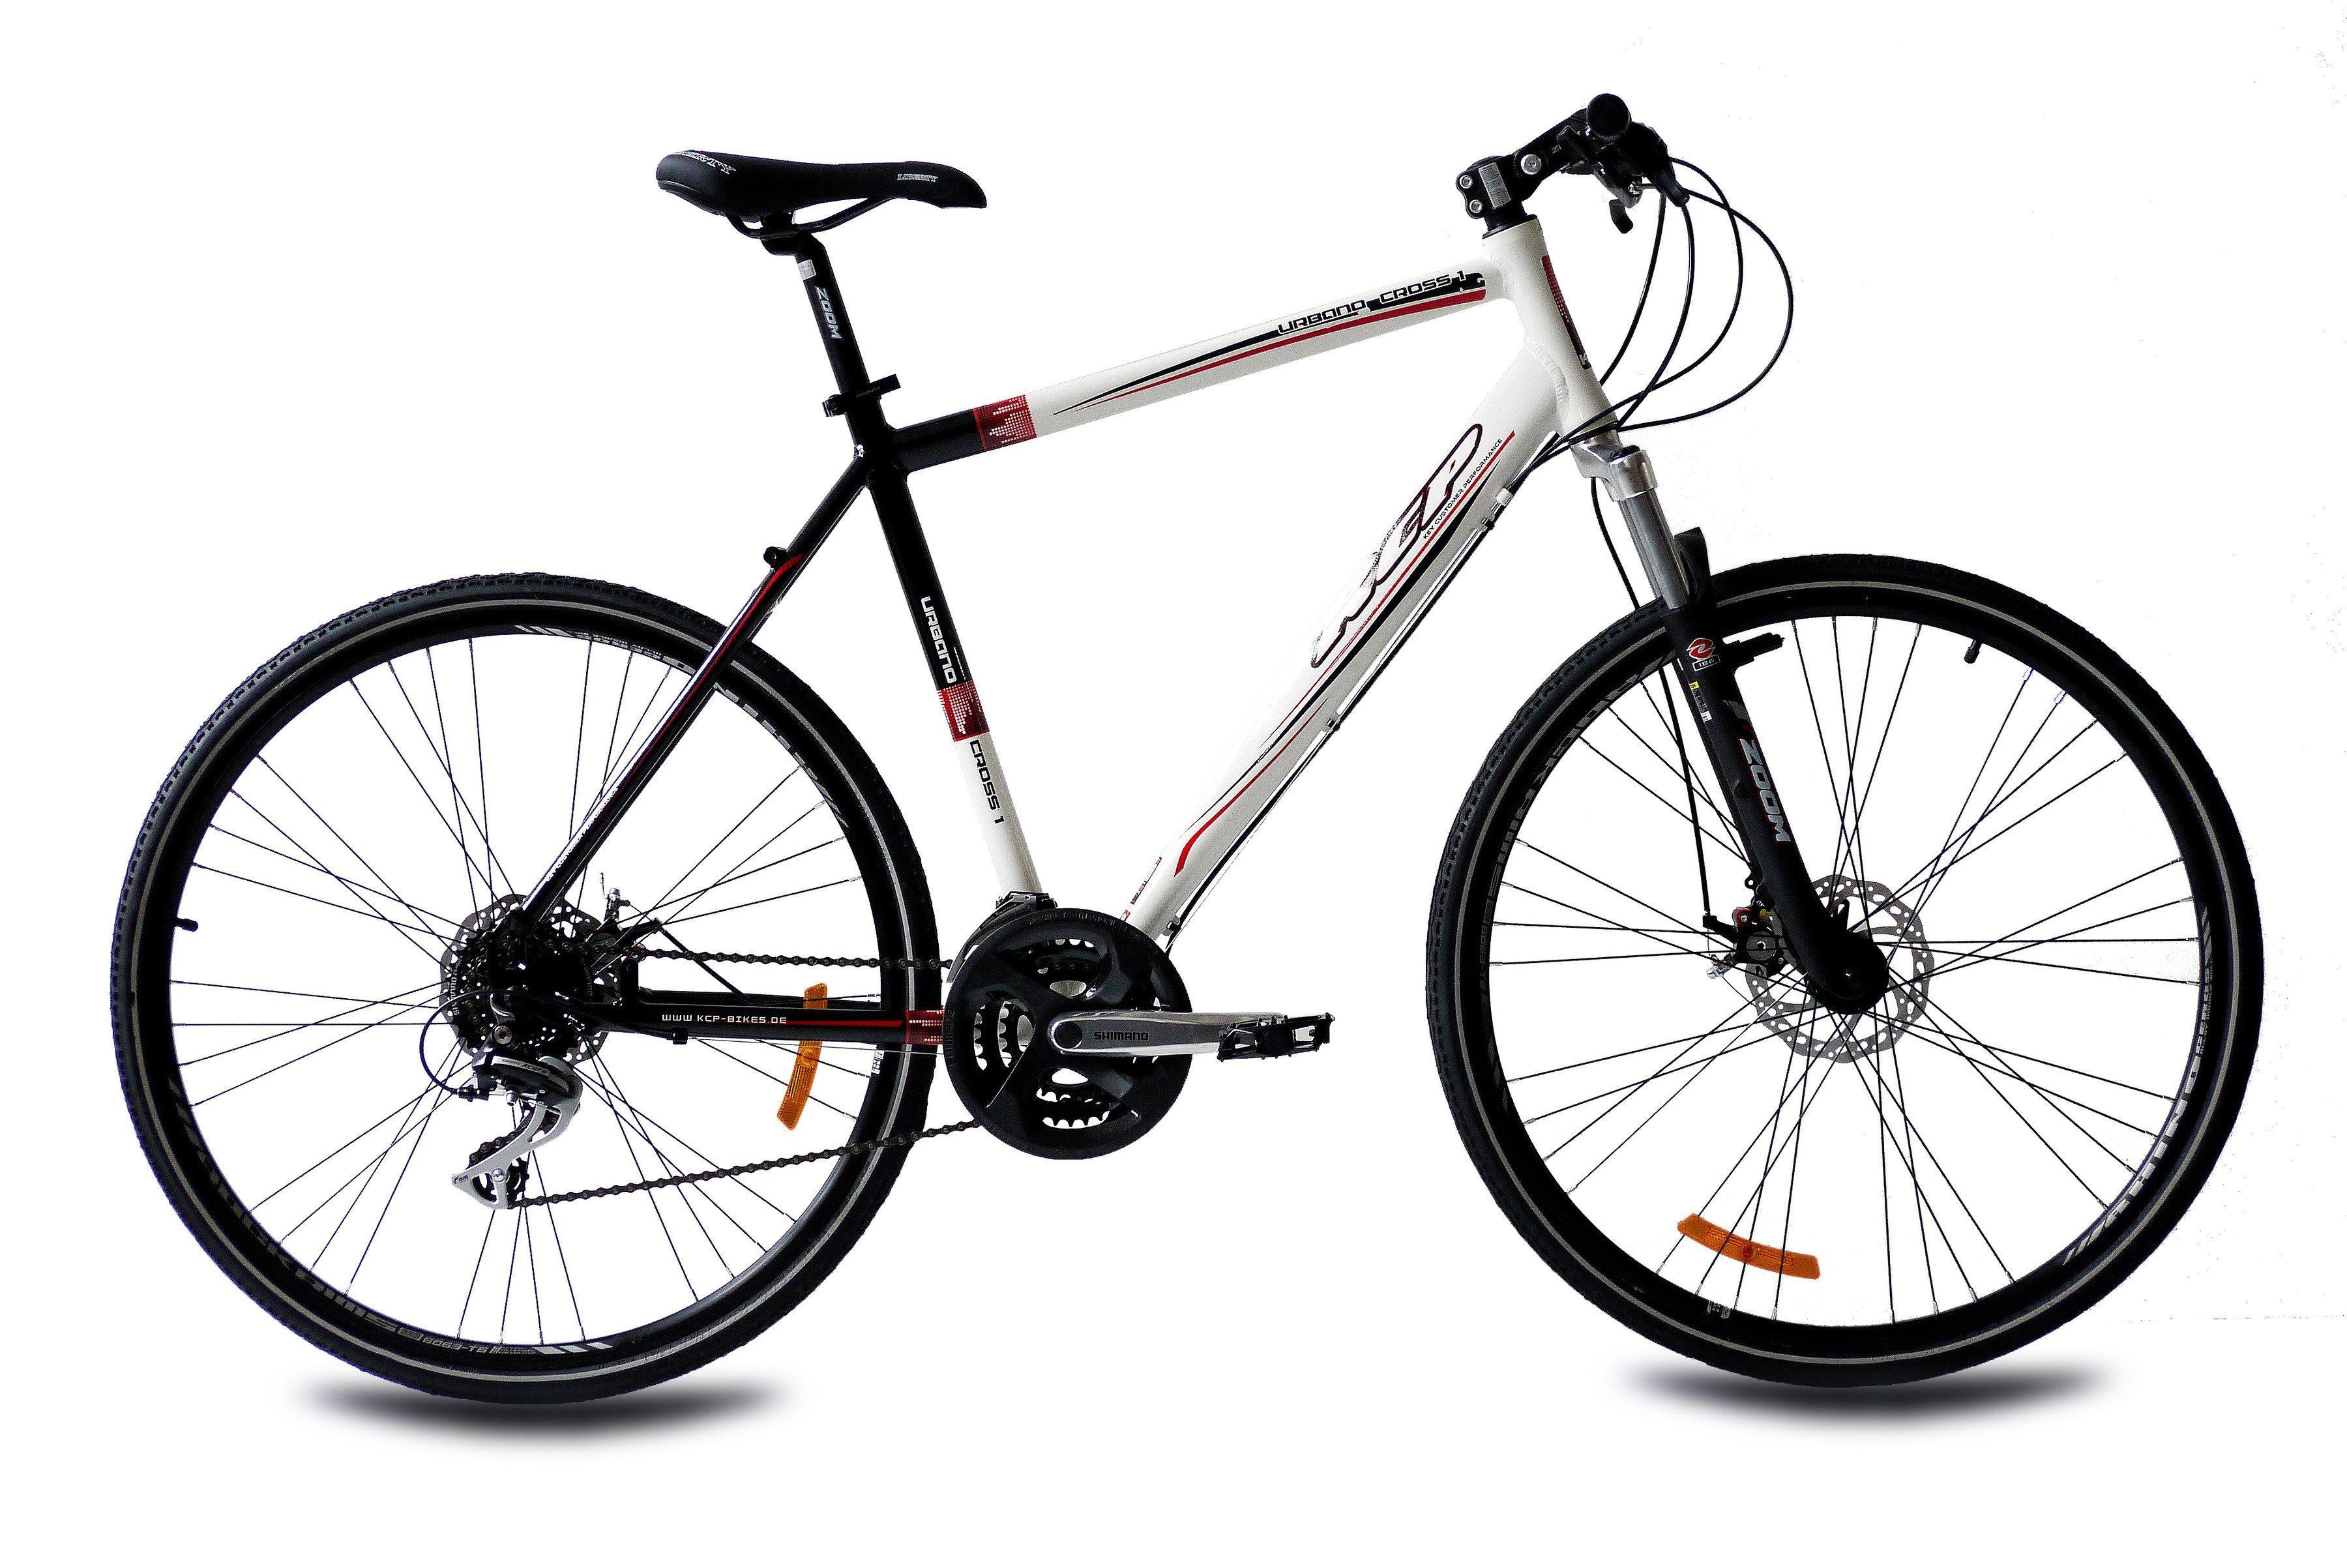 Crossbike »URBANO CROSSLINE 2.0«, 28 Zoll, 24 Gang, Scheibenbremsen